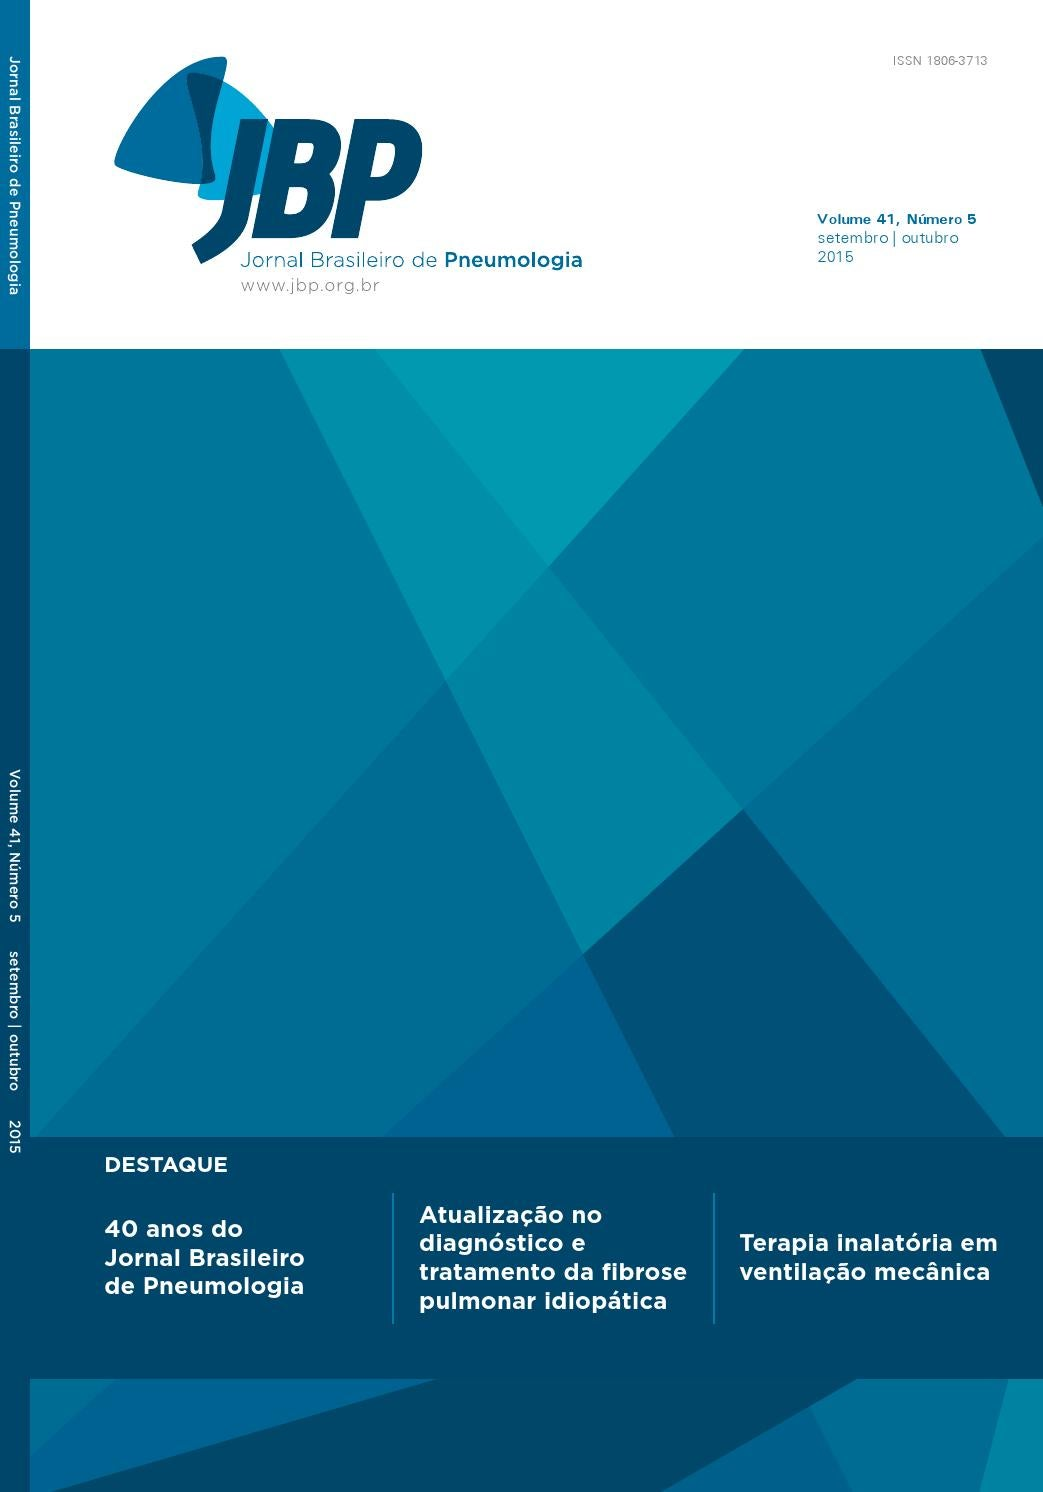 JBP - Volume 41 - Número 5 (setembro outubro) - Ano 2015 by Jornal  Brasileiro Pneumologia - issuu 174da35307